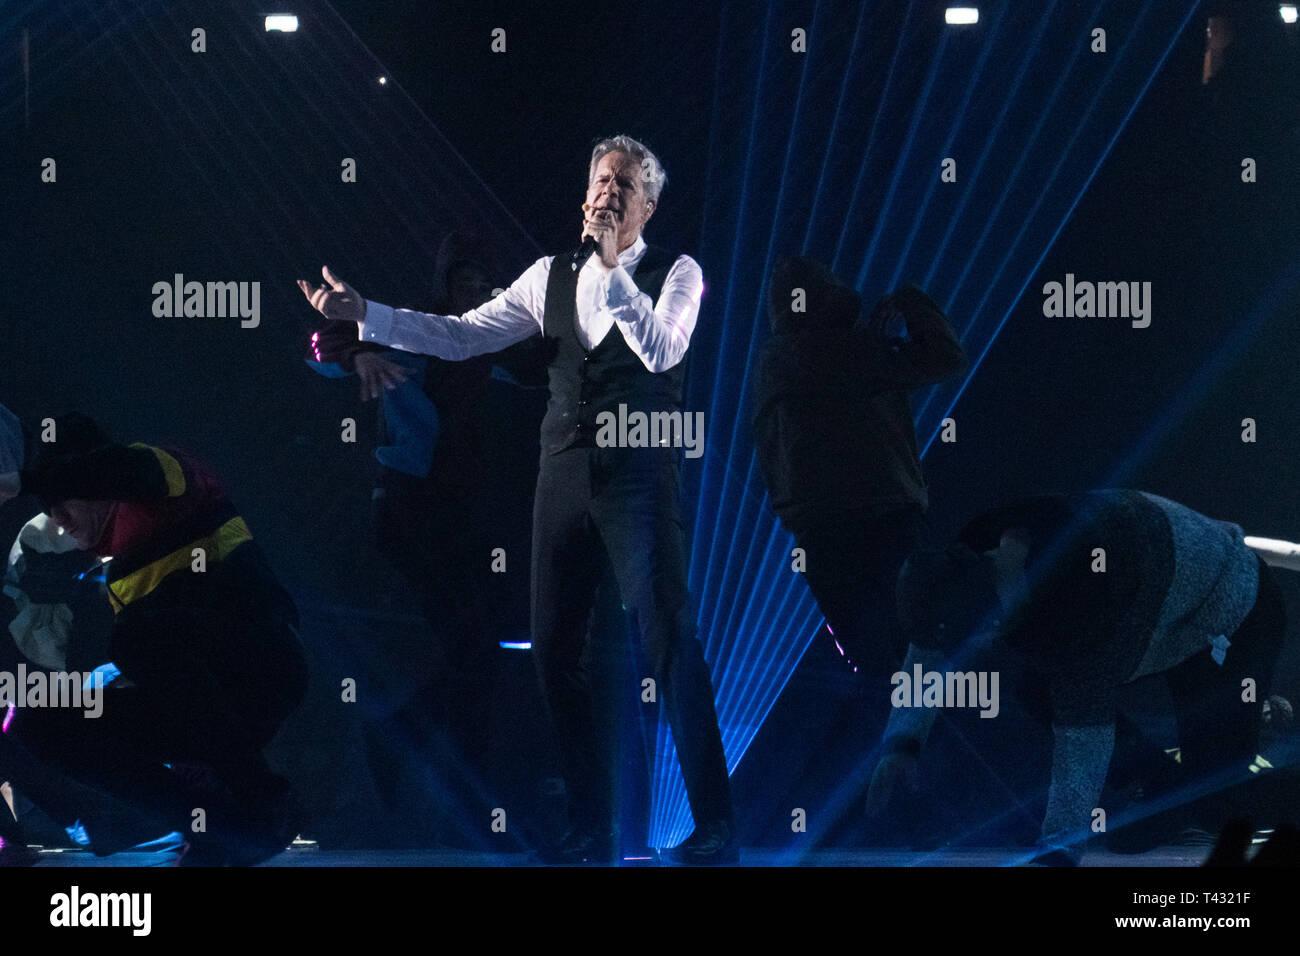 Milan, Italy. April 12, 2019. Claudio Baglioni sings on stage during his Italian Tour Stock Photo